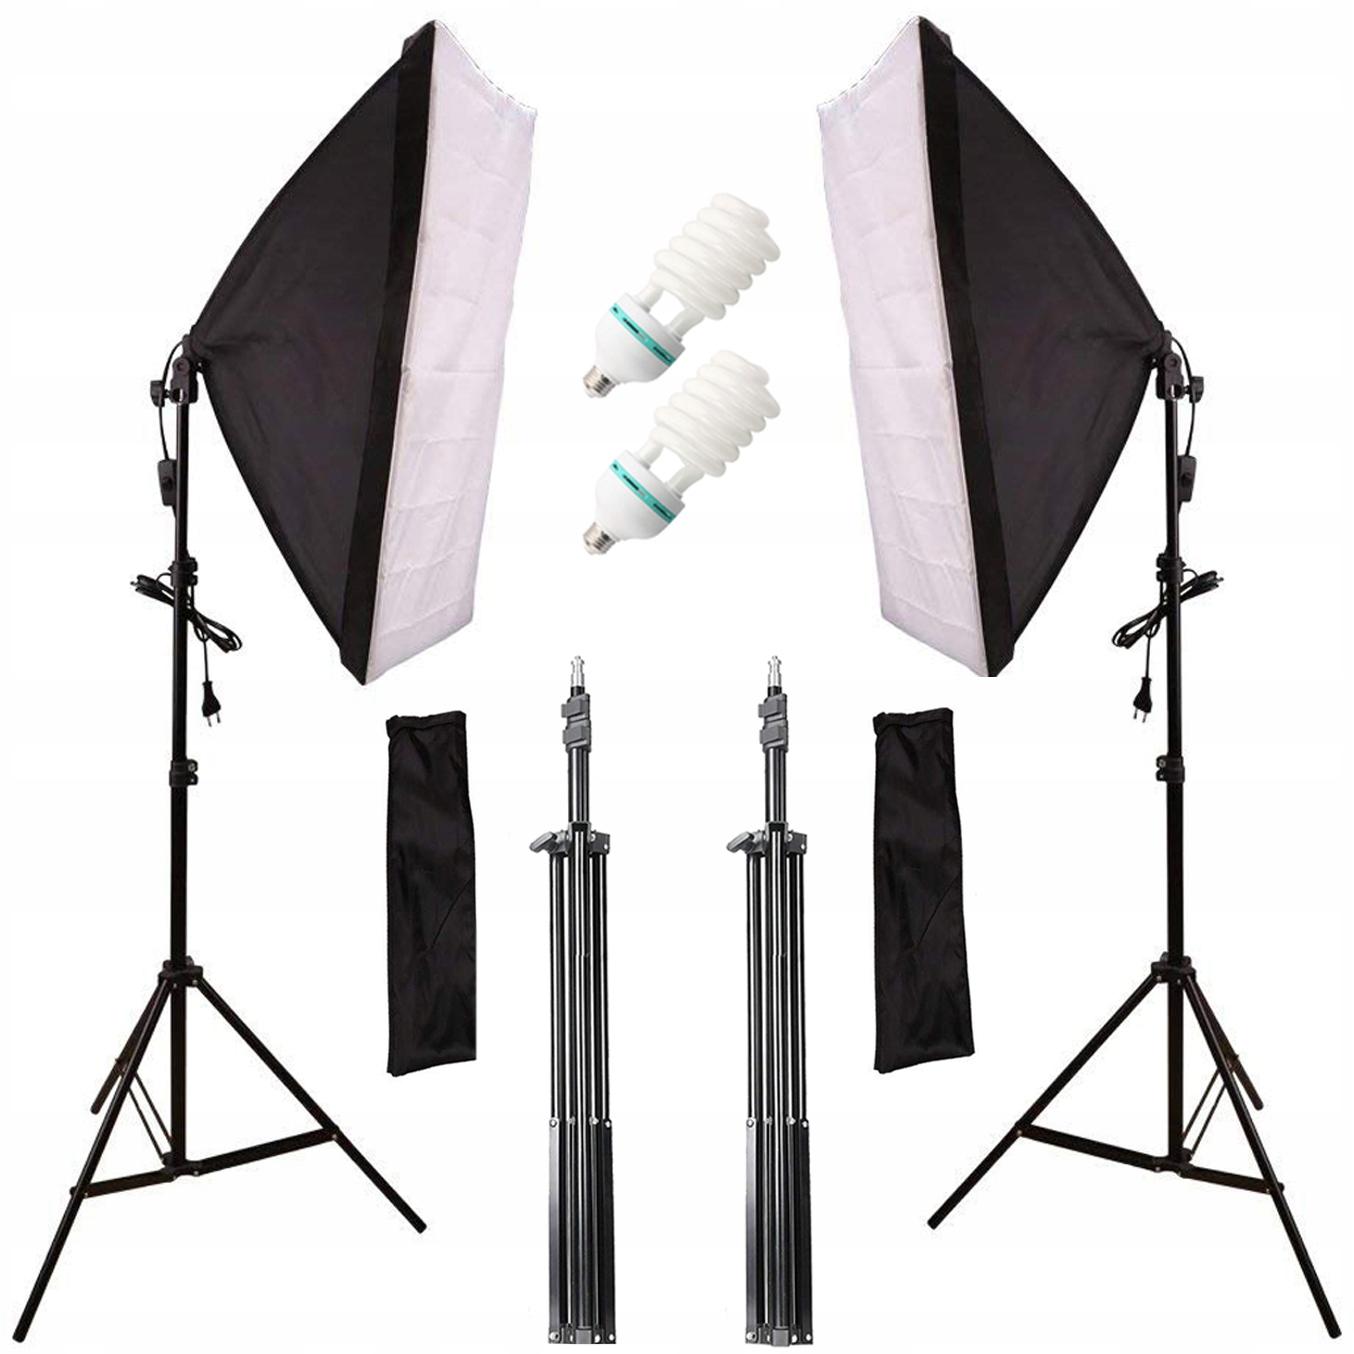 Item 2 LAMP 400W PHOTO TRIPOD for SOFTBOX 50x70 cm